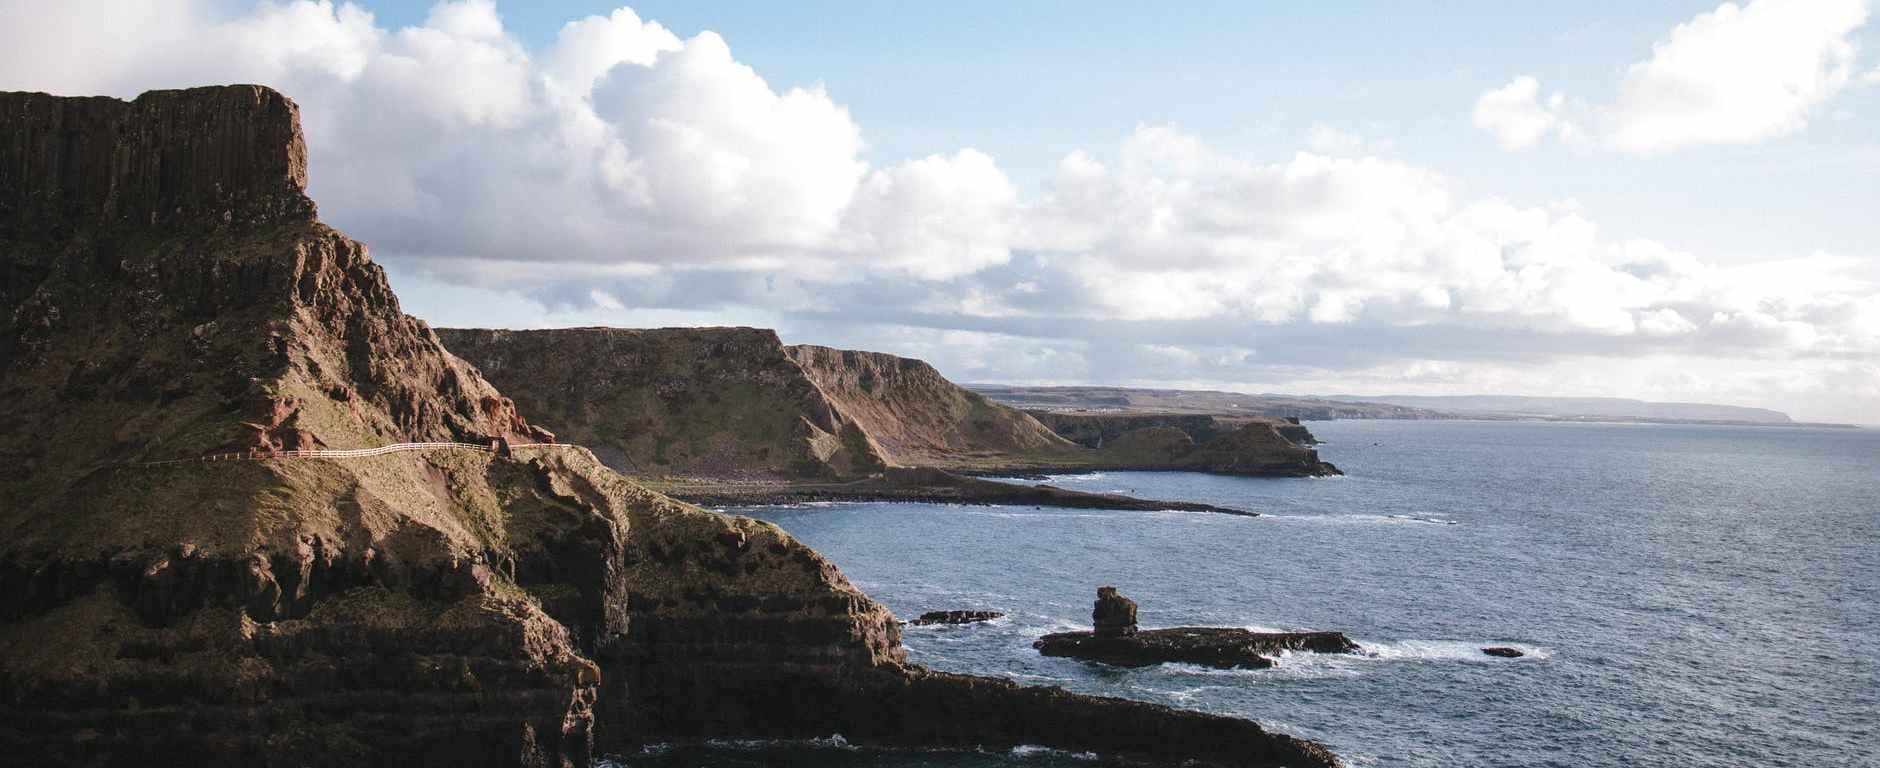 rocky coast against calm sea during sunny day